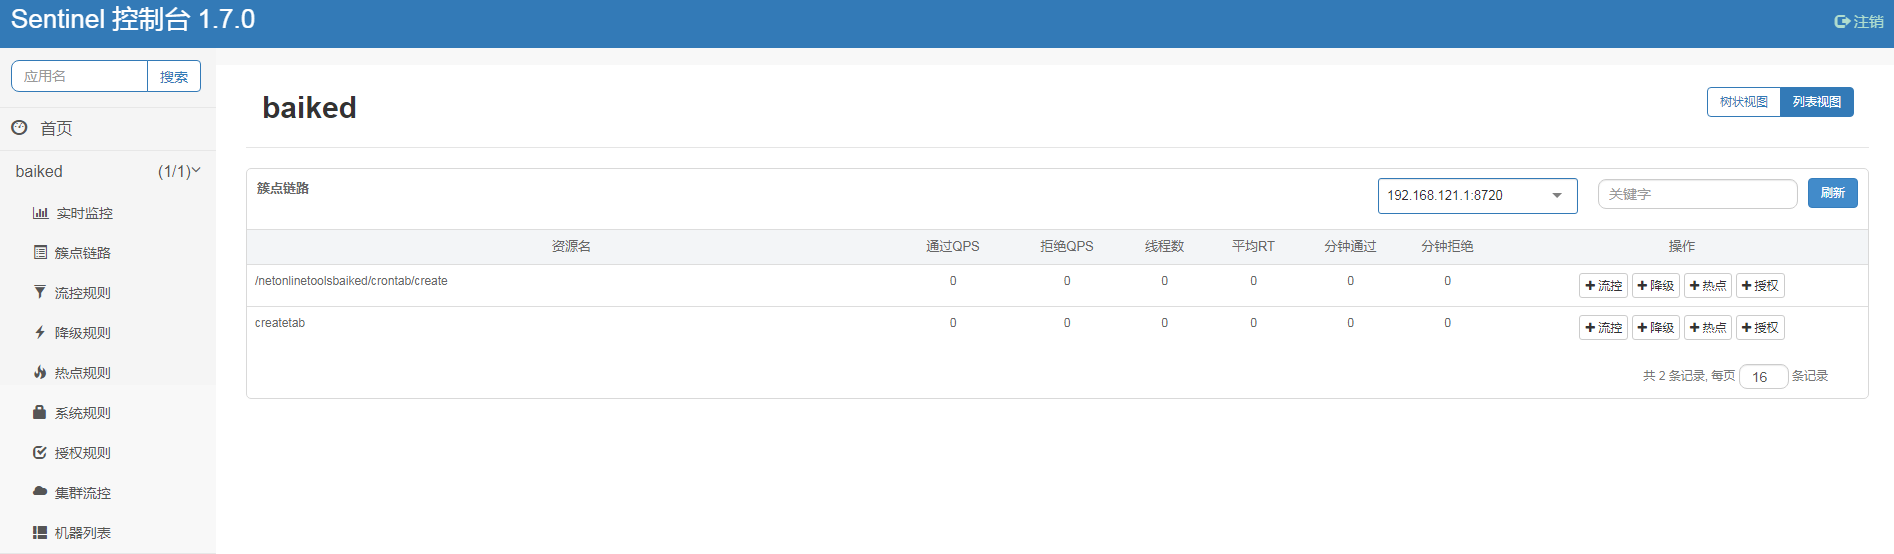 SpringBoot  + Nacos + Sentinel 流控规则集中存储详解